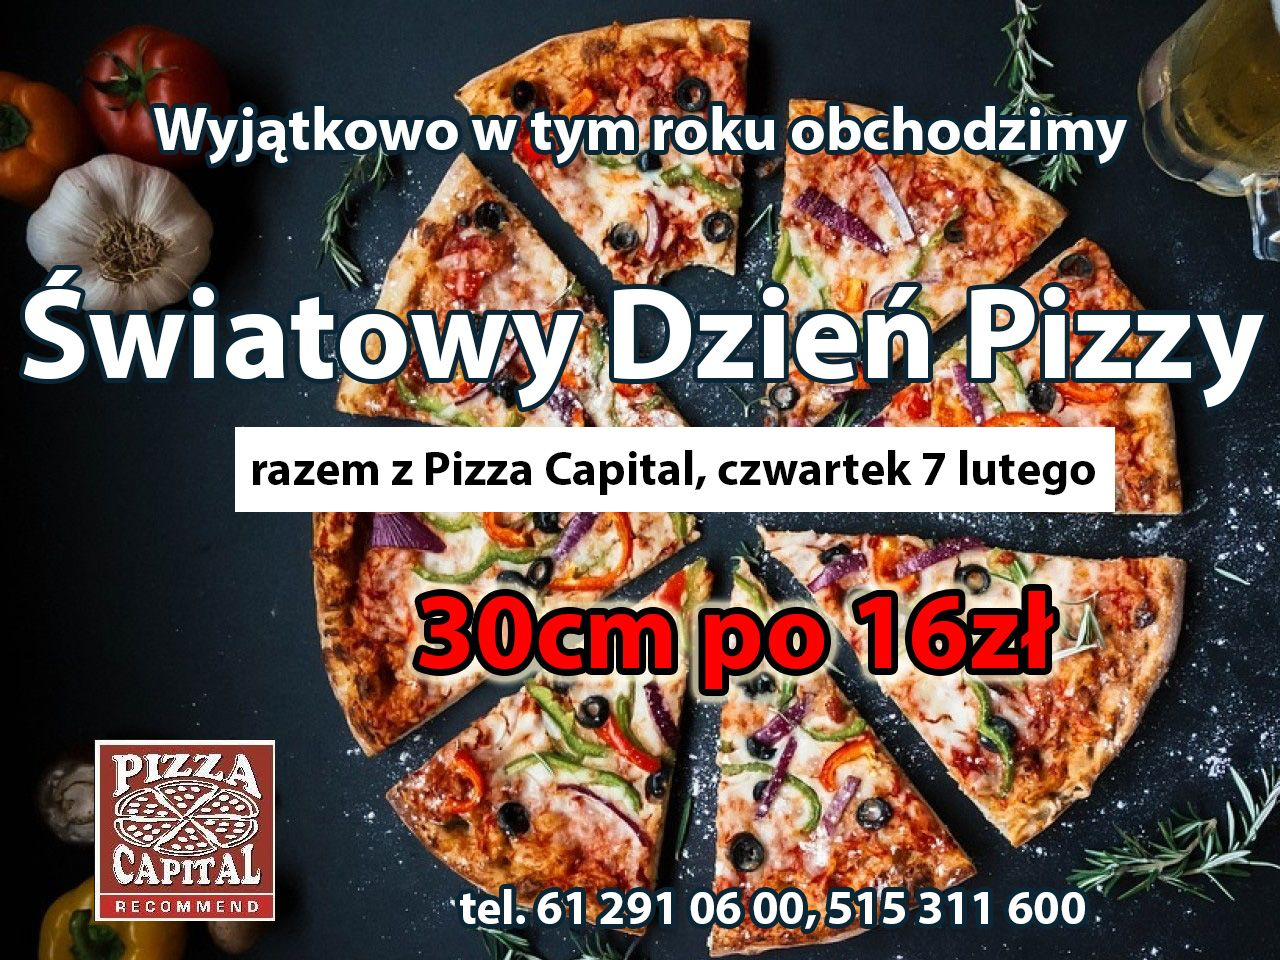 Pizza Capital świętuje już jutro